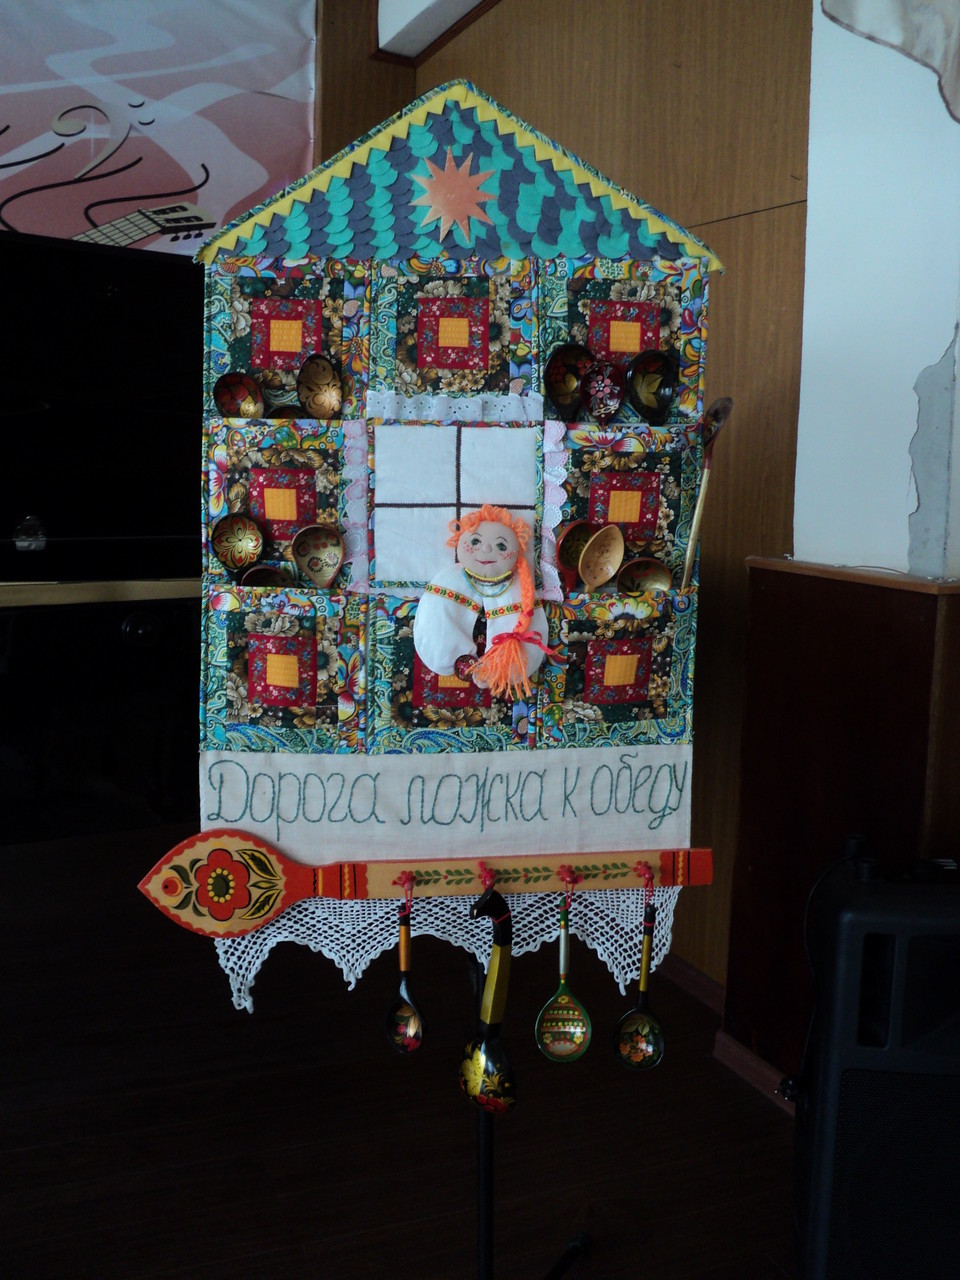 Выставка декоративно - прикладного творчества учащихся СОШ №35, преподаватель Ташбулатова Ольга Александровна